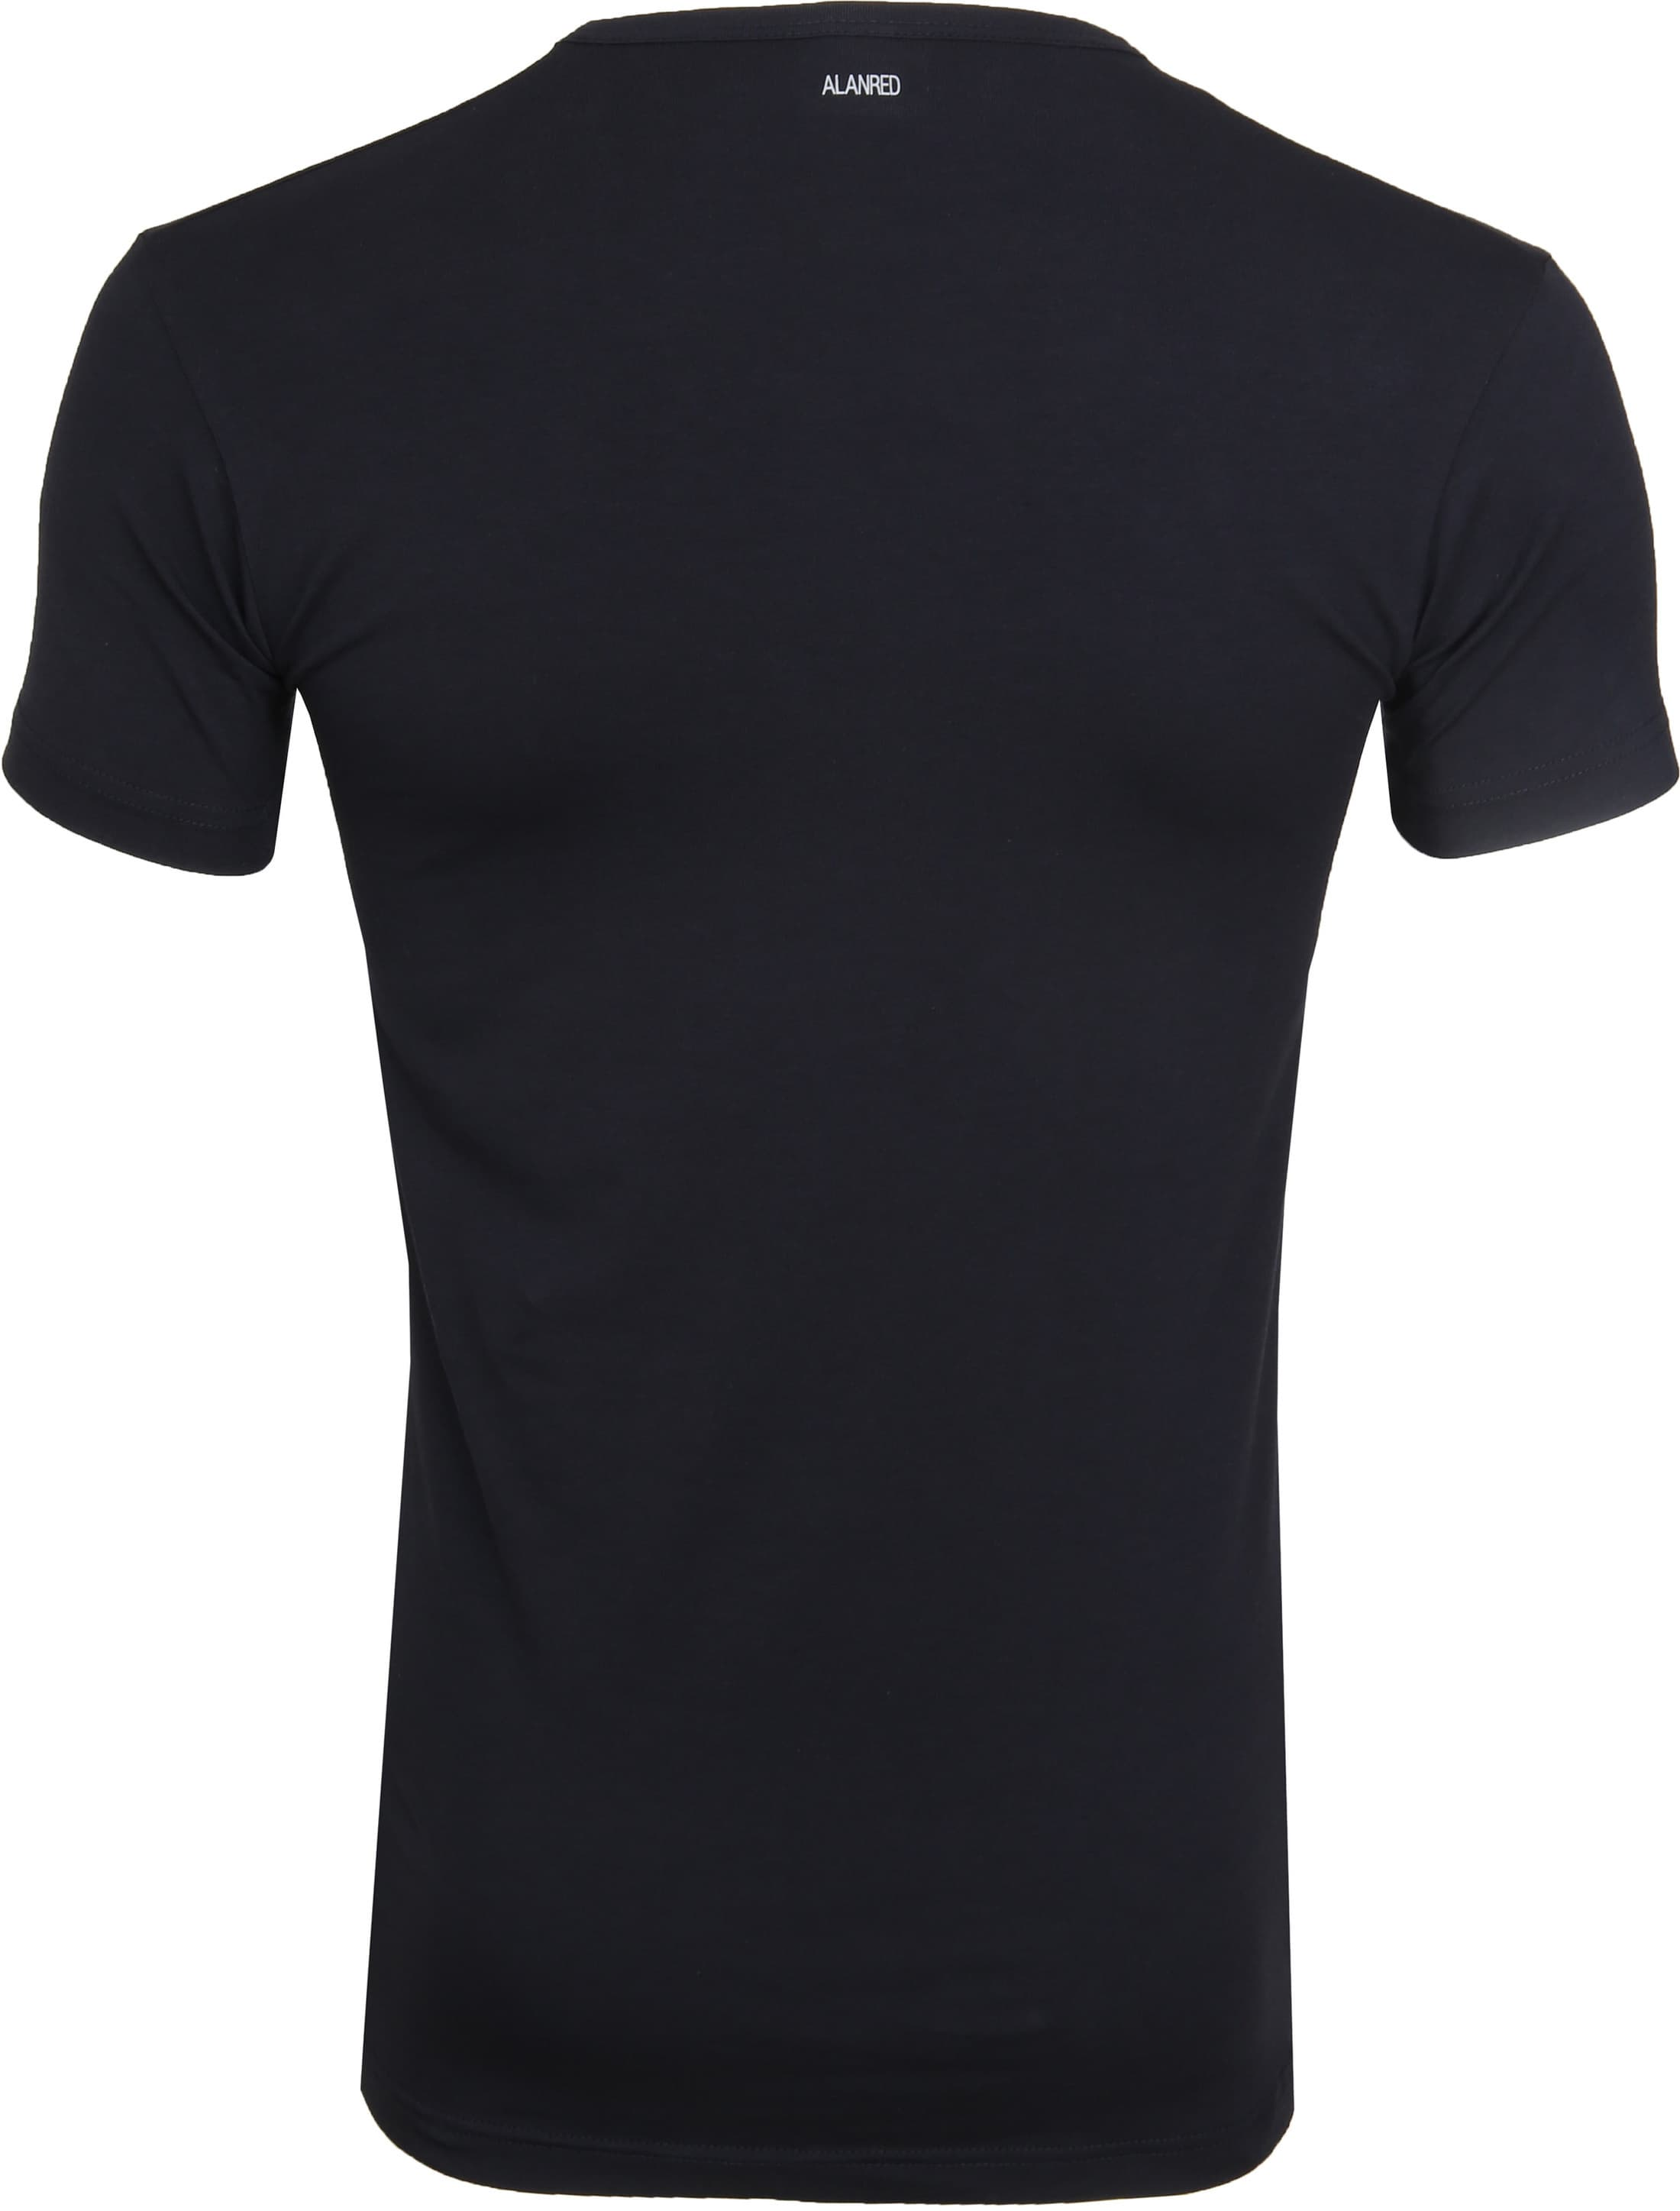 Alan Red Oklahoma T-Shirt Stretch Navy (2-Pack) foto 3